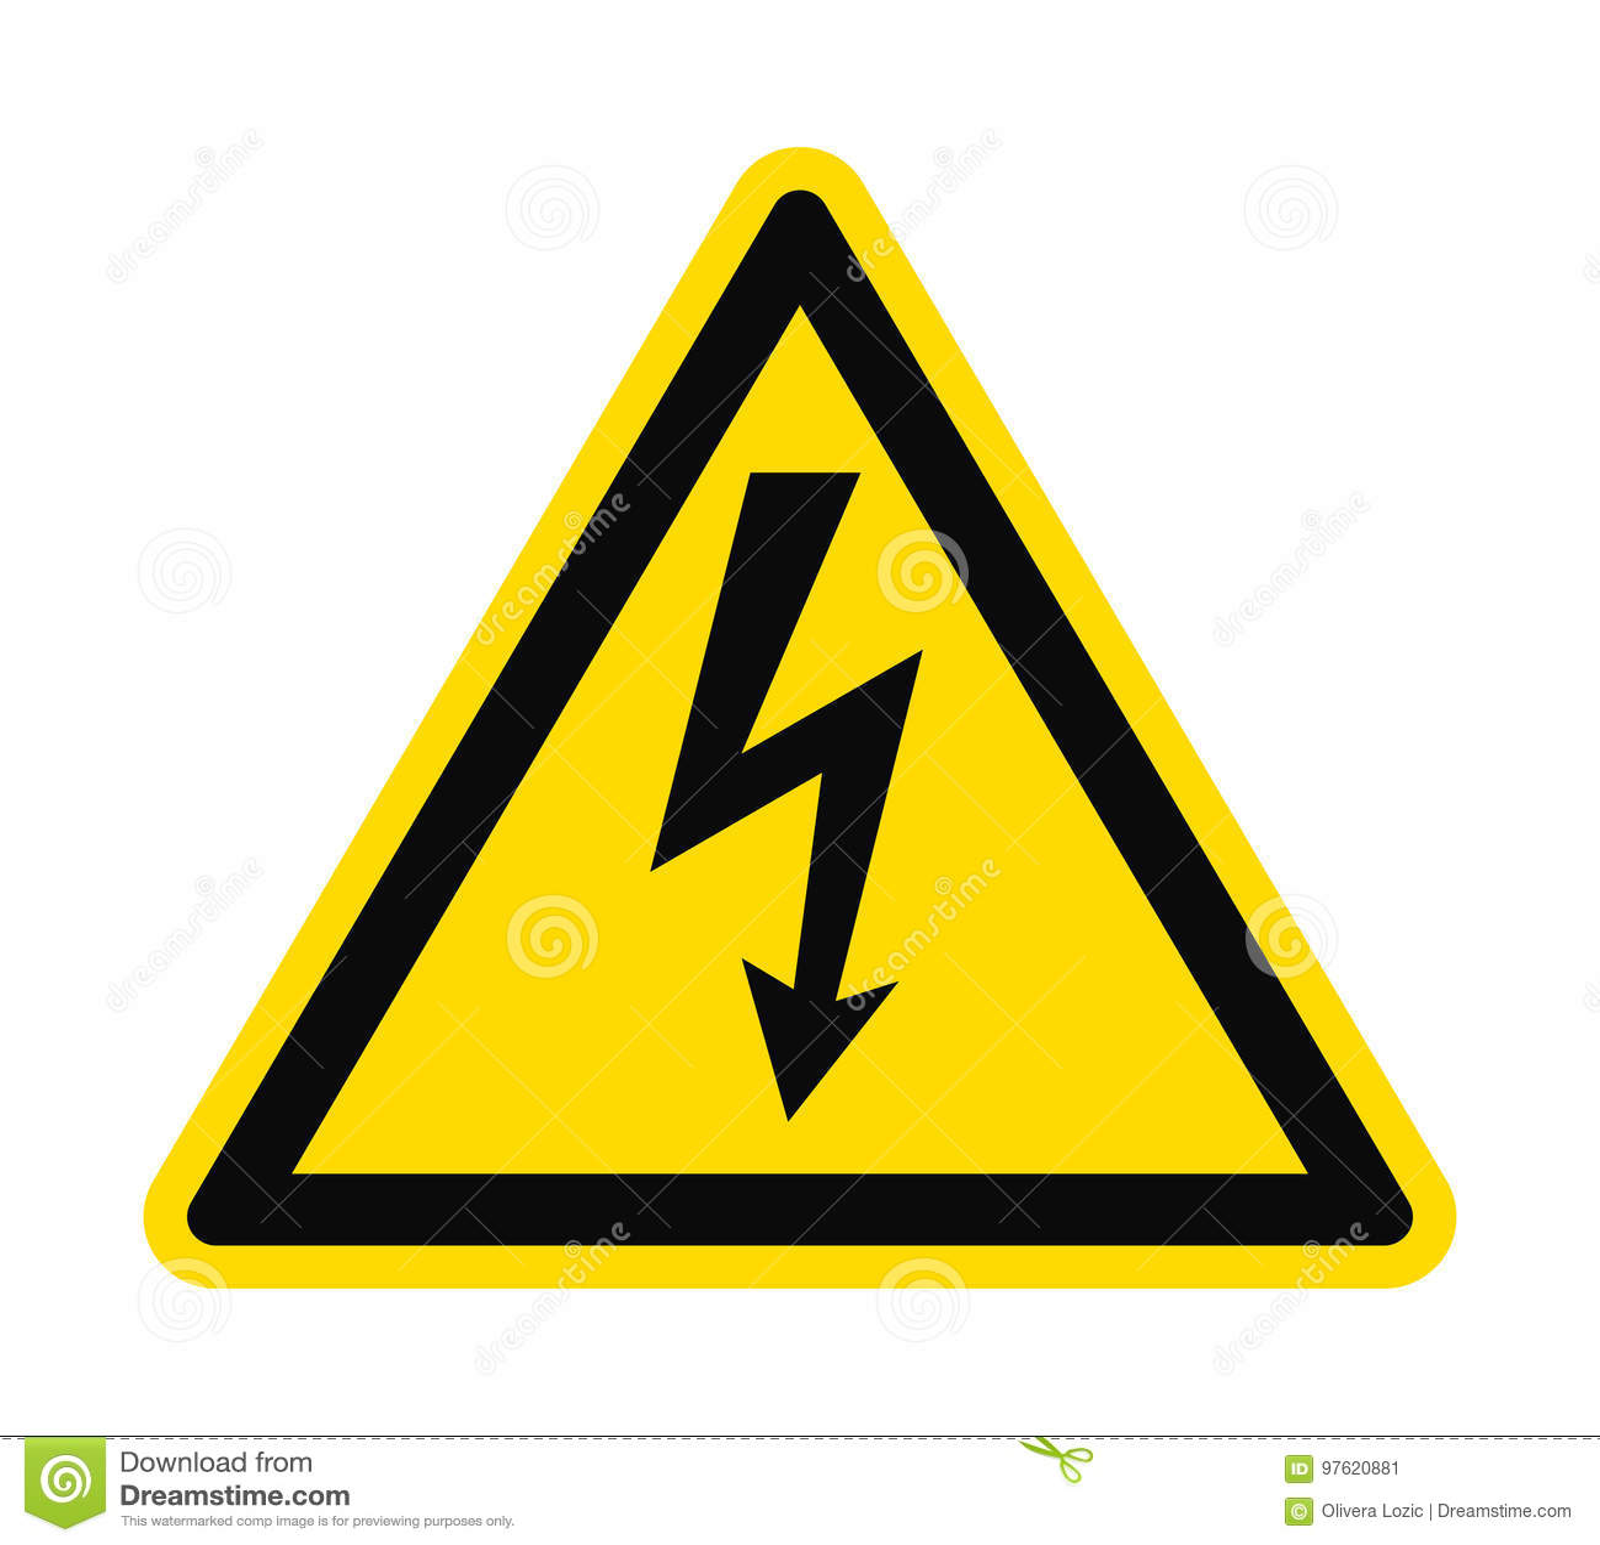 Flat icon danger high voltage